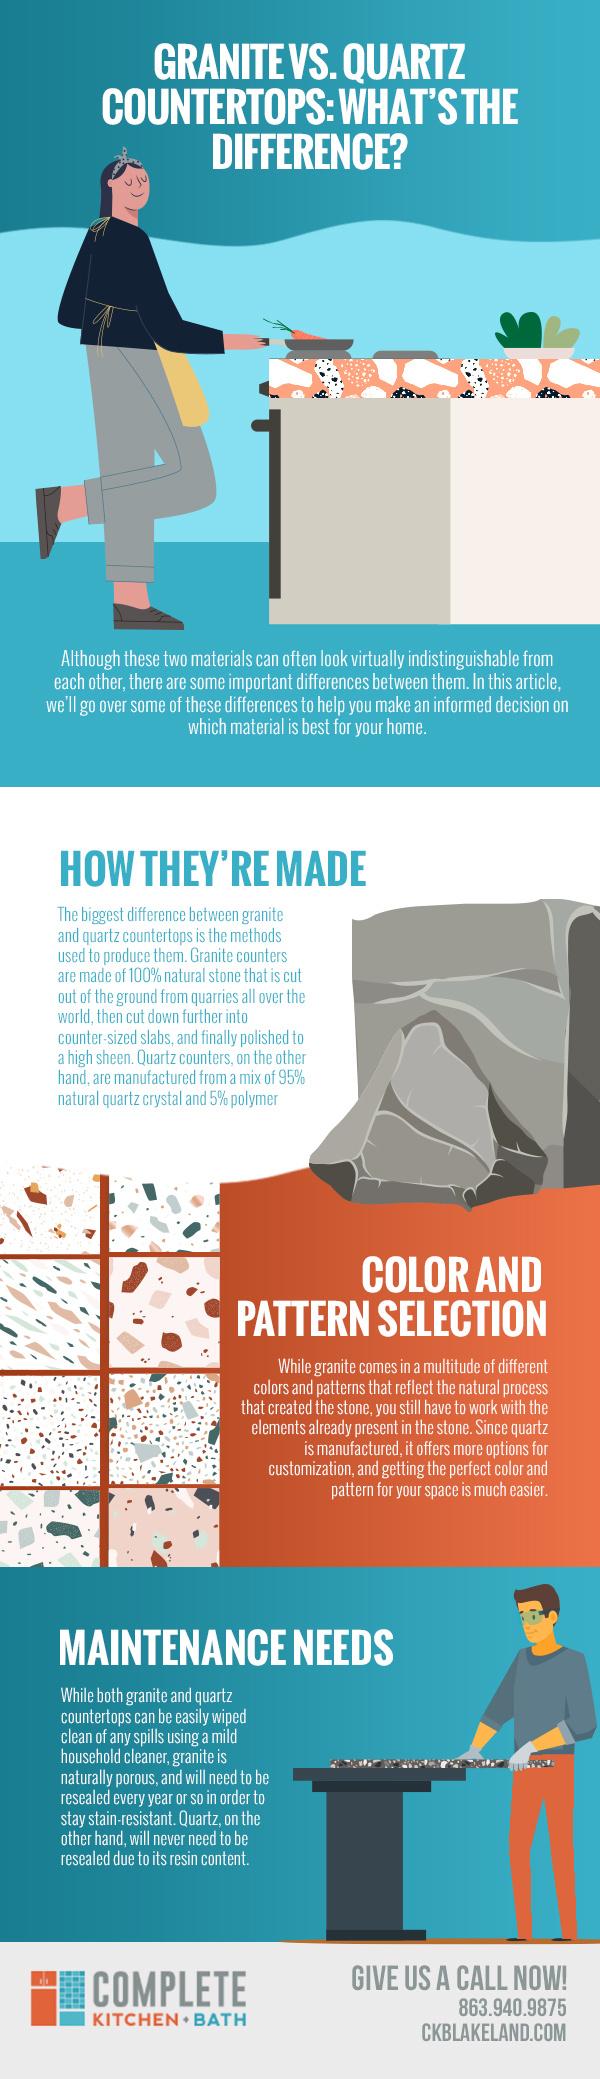 Granite vs. Quartz Countertops: What's the Difference? [infographic]